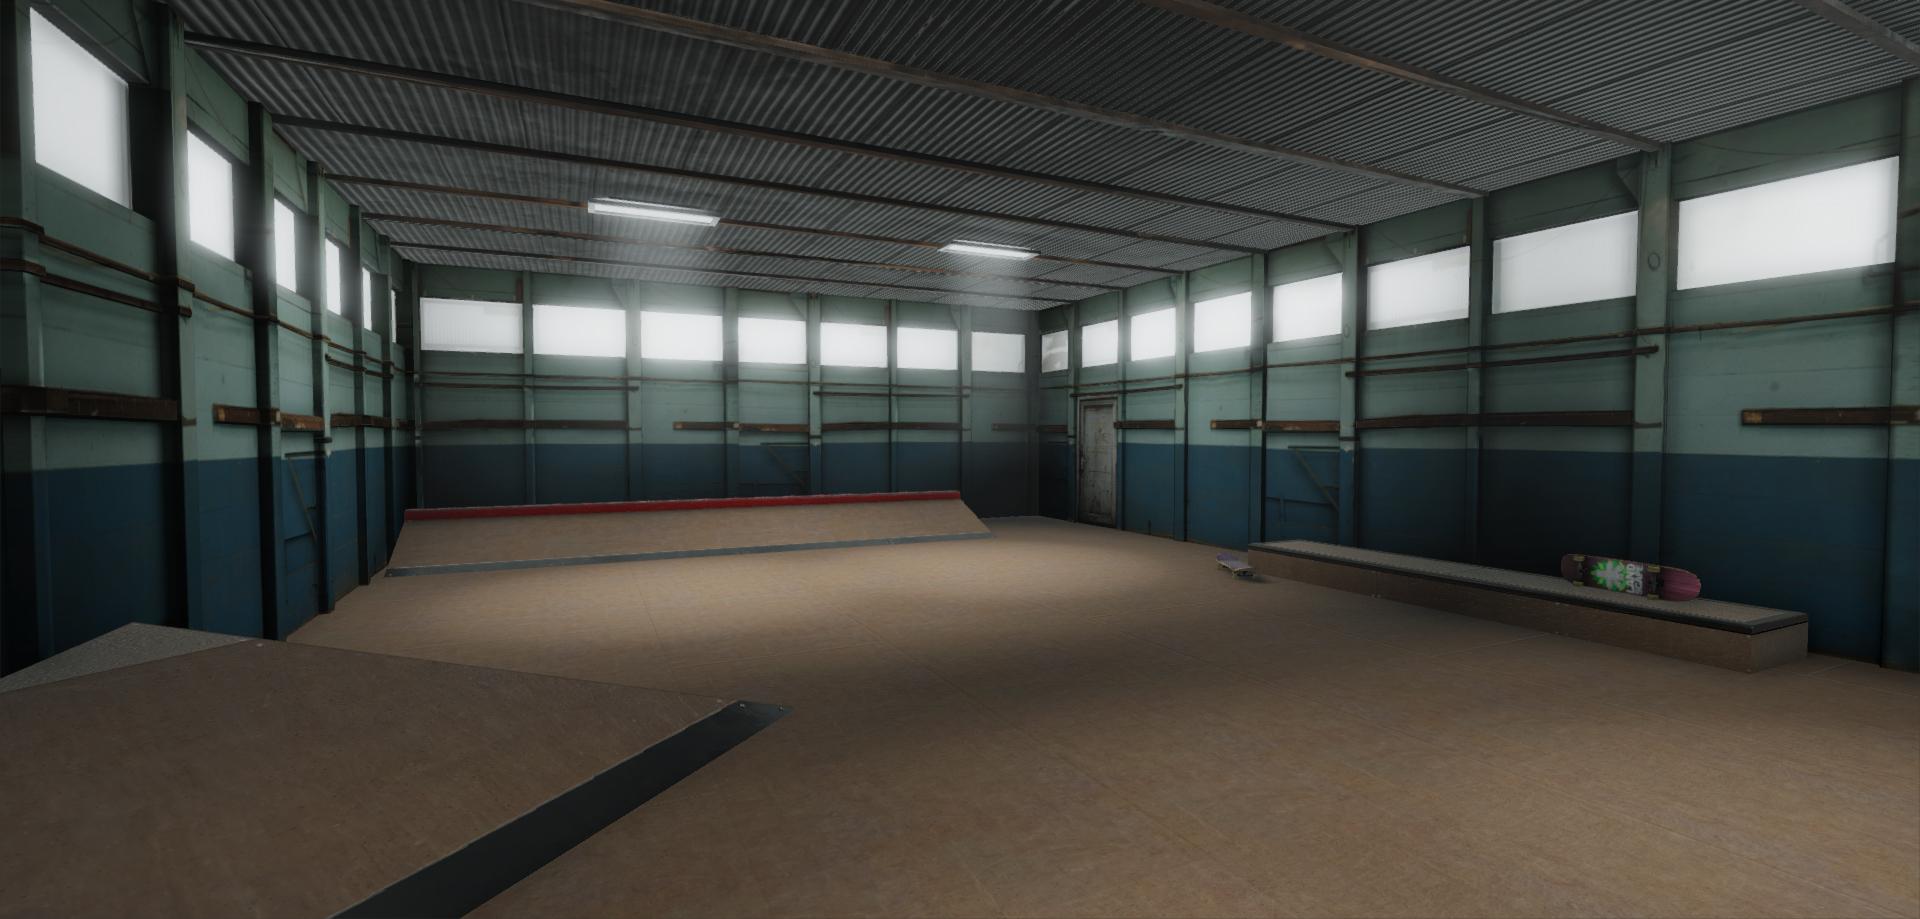 Moseley's Skatepark VR Demo